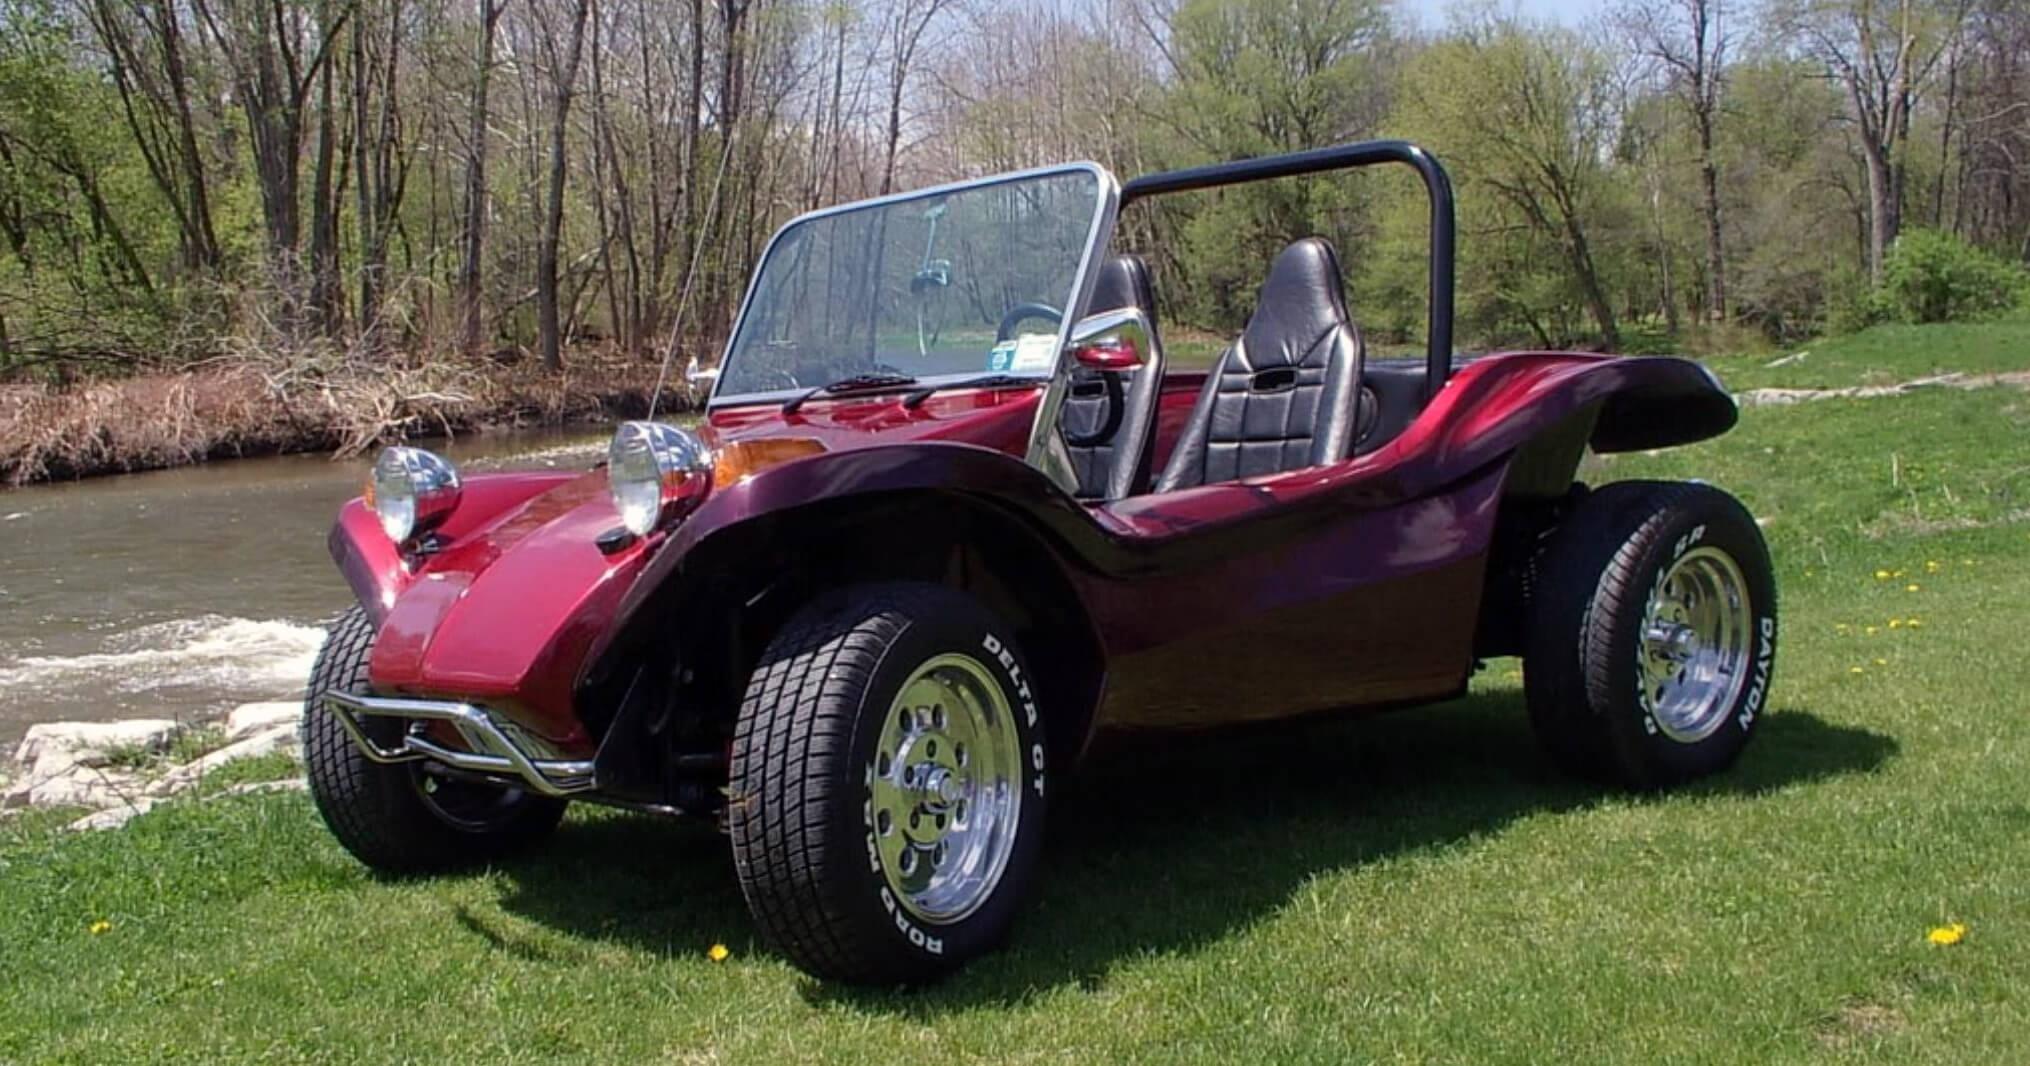 Dune Buggy Bumpers : Manx dune buggy parts mooreparts